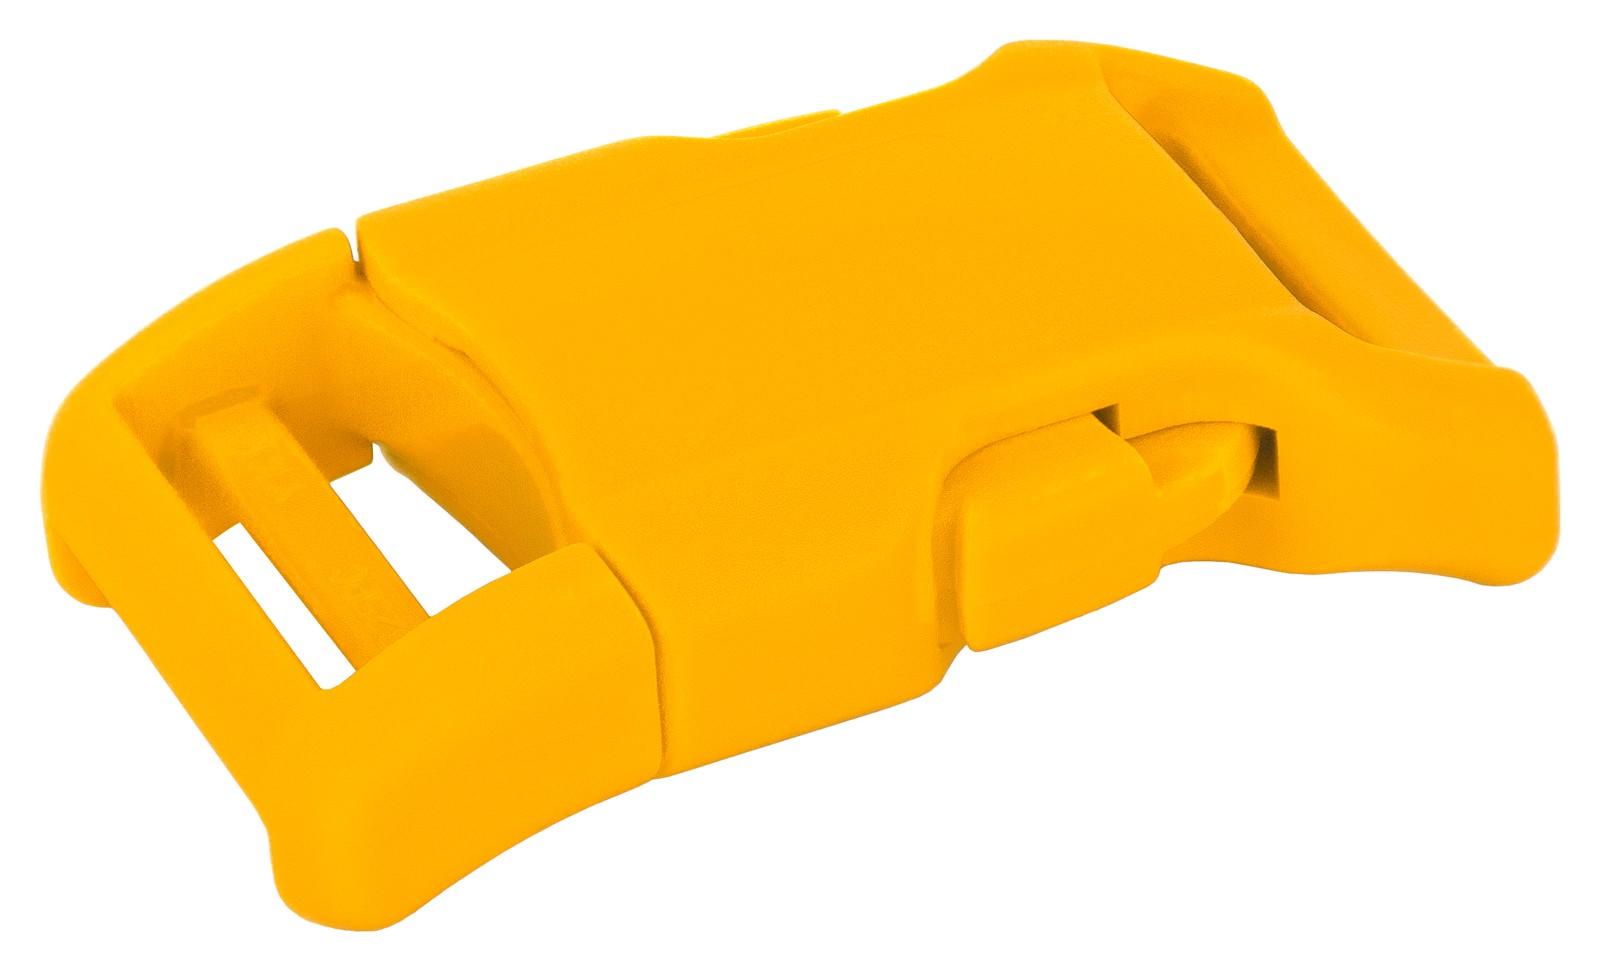 Buy 1 Inch Yellow Ykk Contoured Side Release Plastic